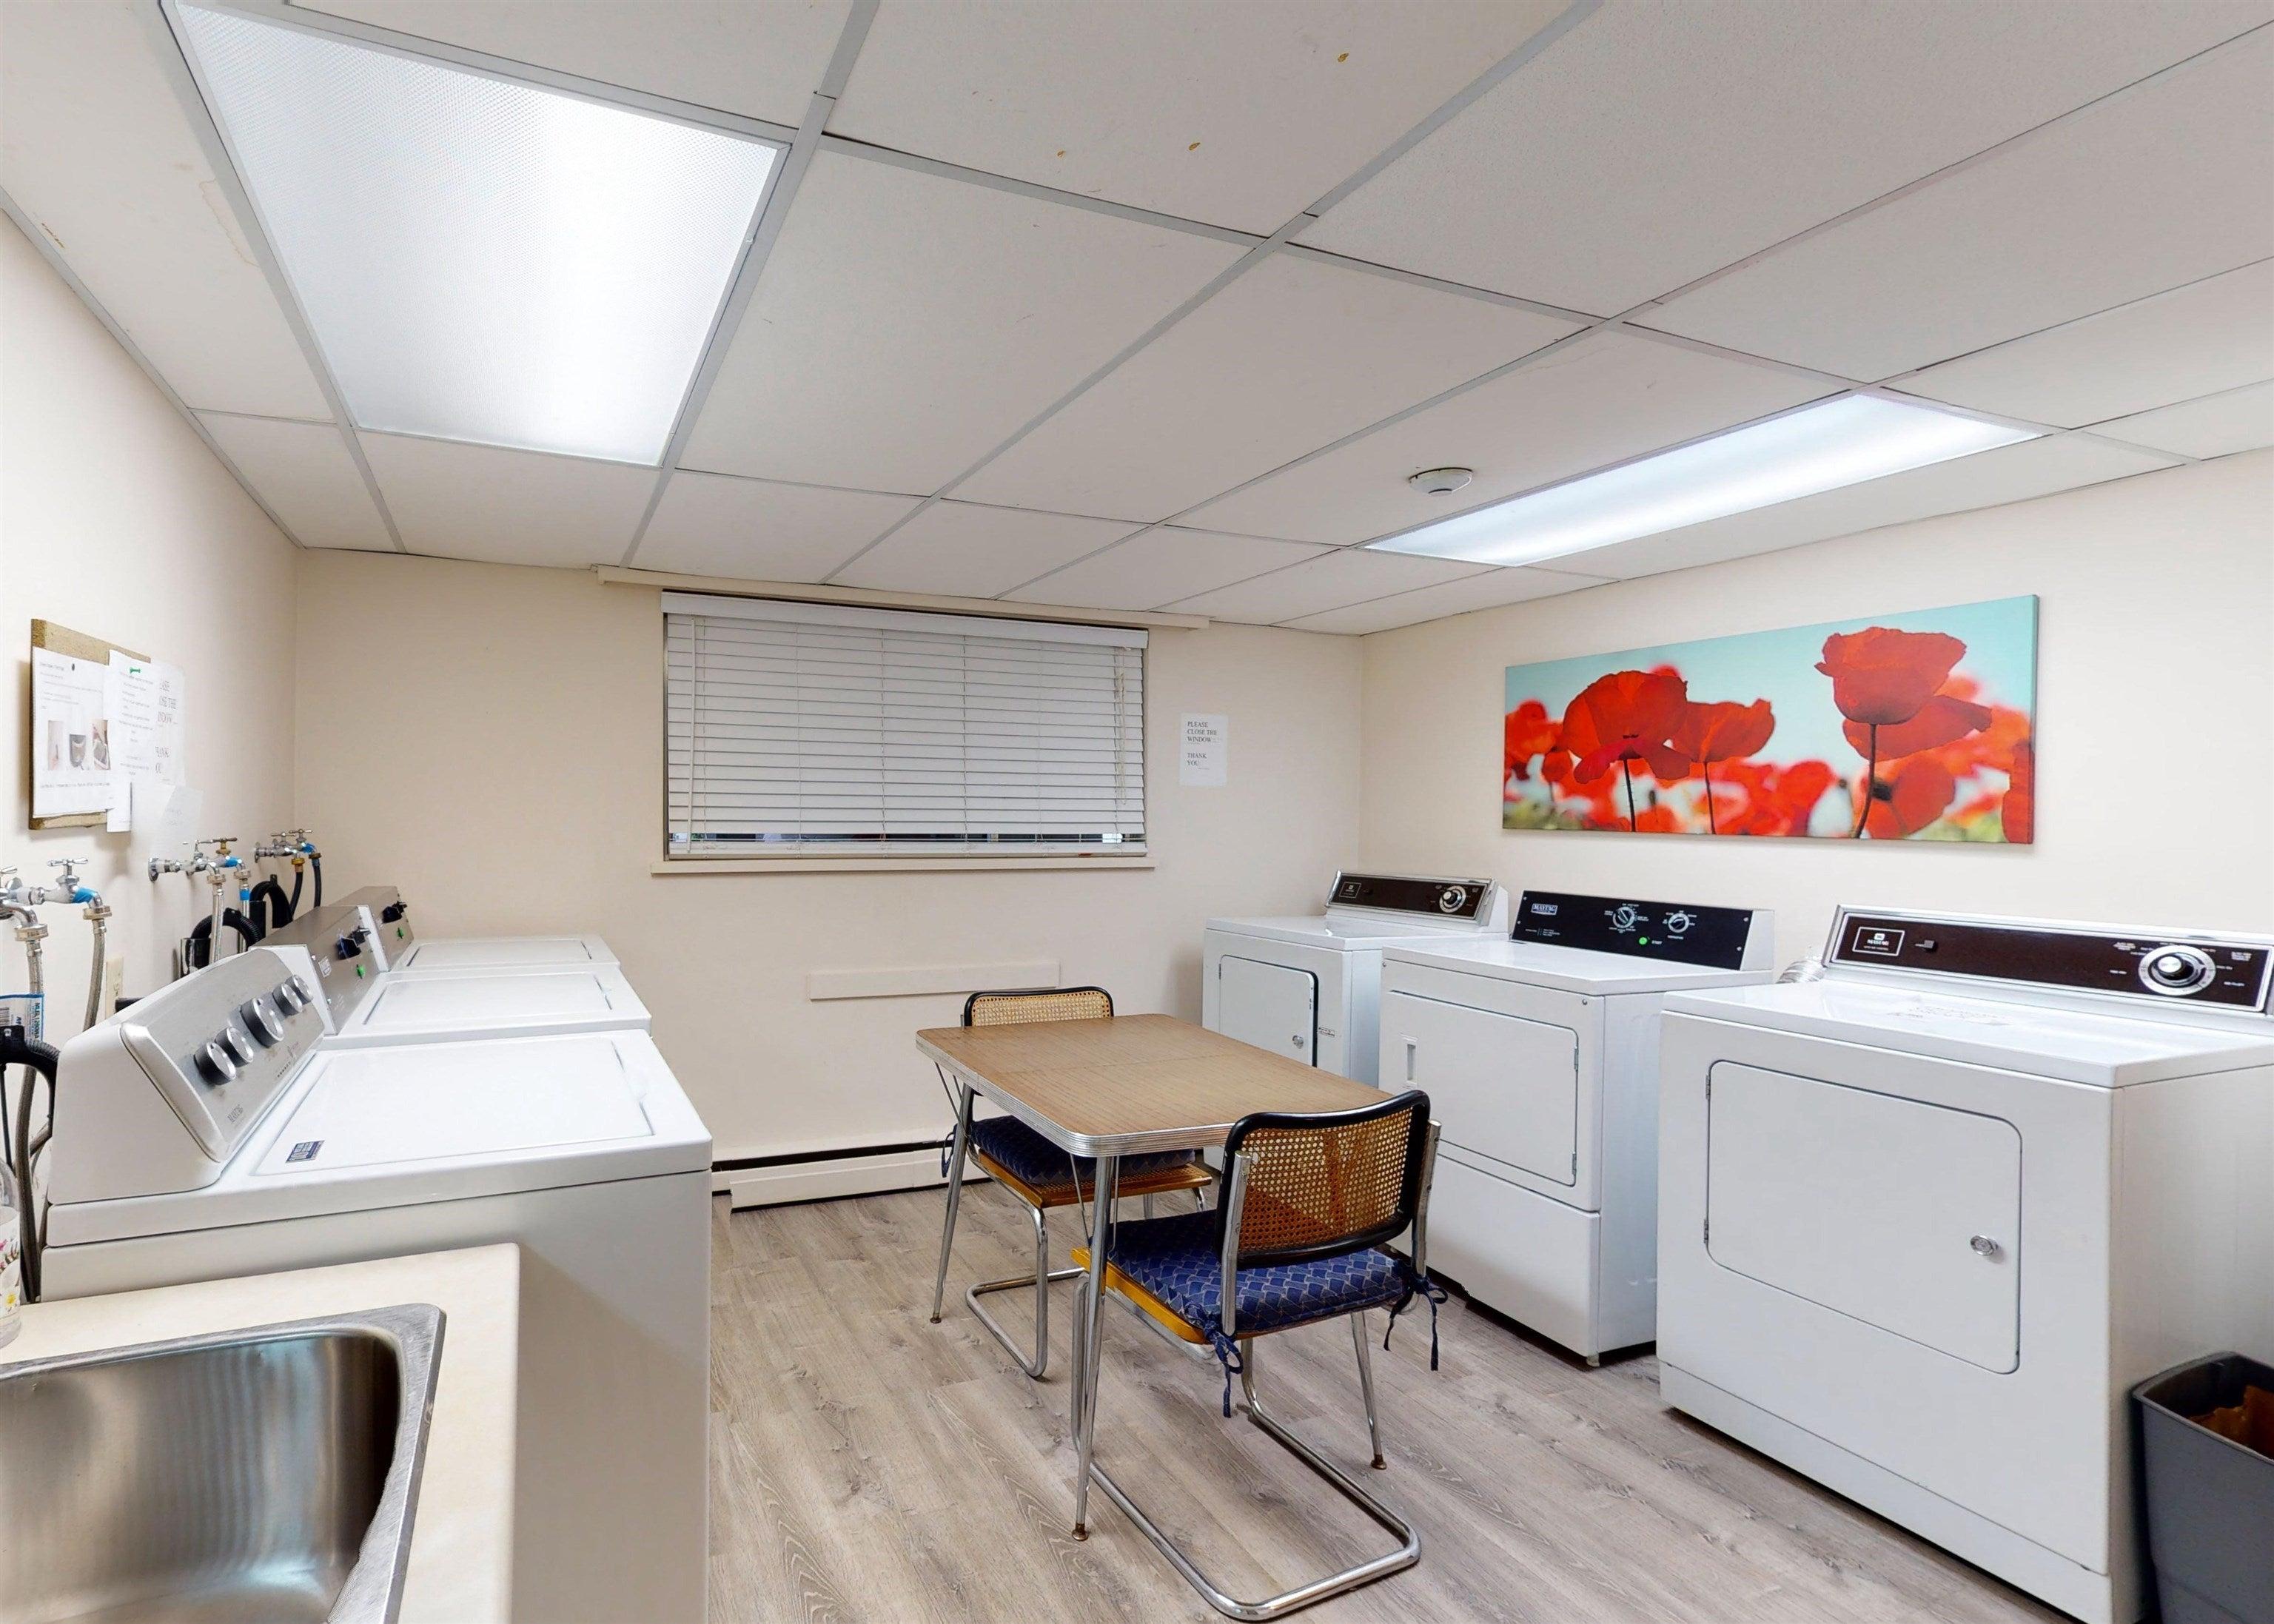 202 1750 ESQUIMALT AVENUE - Ambleside Apartment/Condo for sale, 1 Bedroom (R2610188) - #21